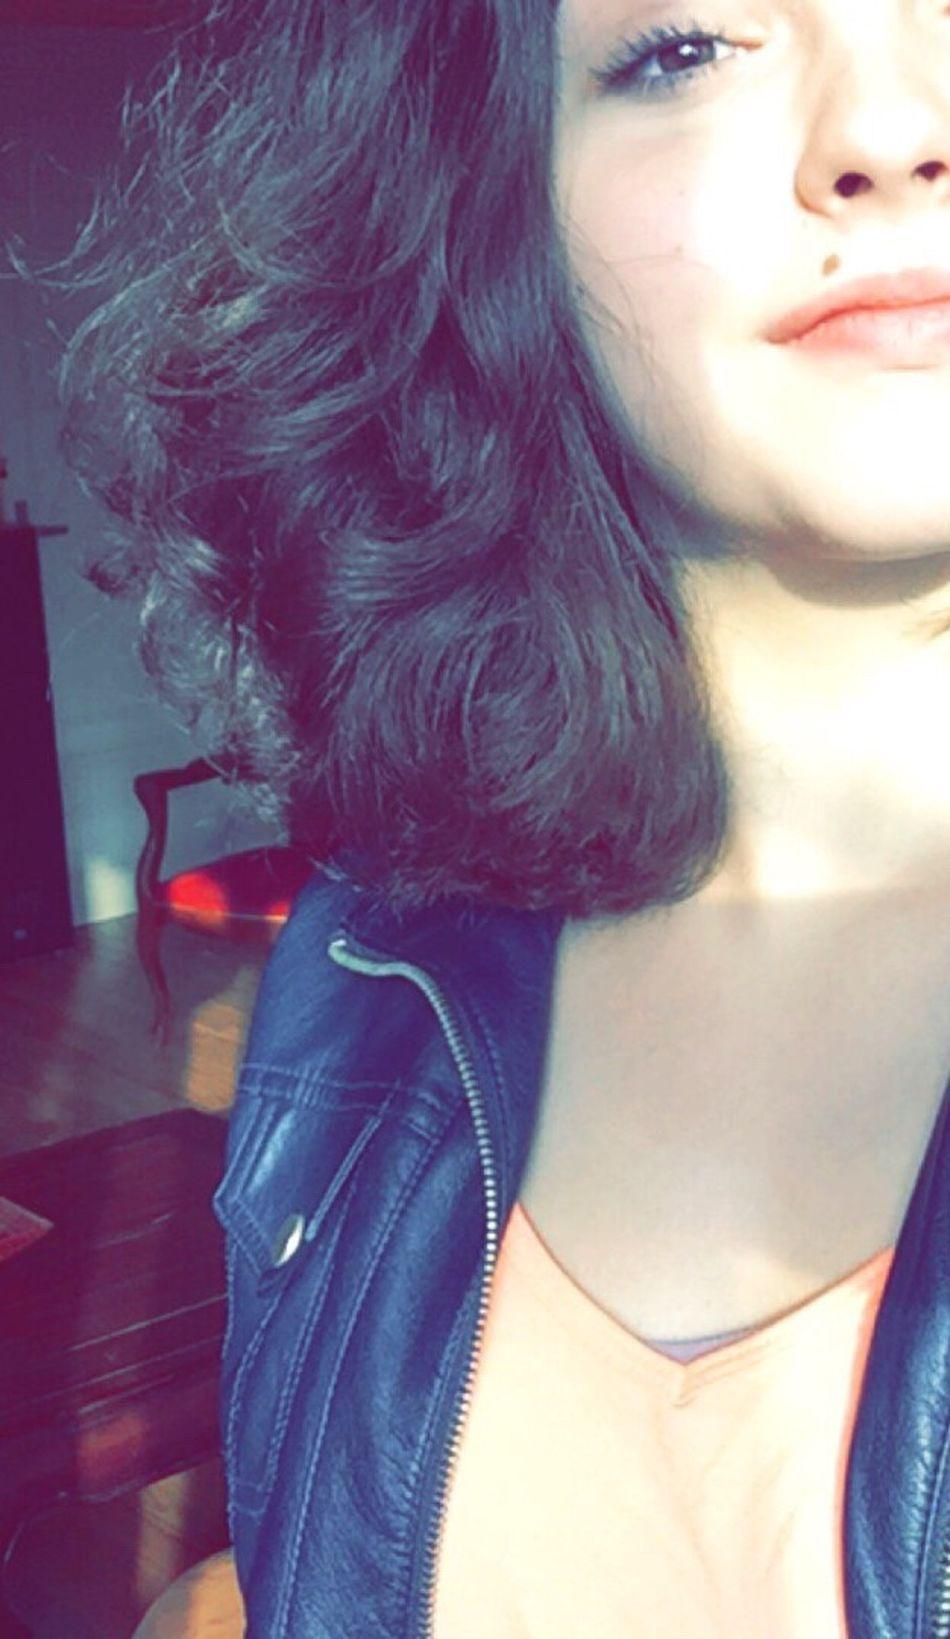 French Freedom Frenchgirl Beautiful Girl Girls Hair Beautiful ♥ Beauty Beautiful Girl Bella Italia Focfoel Selfi Selfportrait Selfie ✌ Selfies Selfie✌ Selfie Portrait Selfie ♥ Bella Selffie France Lol :) Dance Bestoftheday